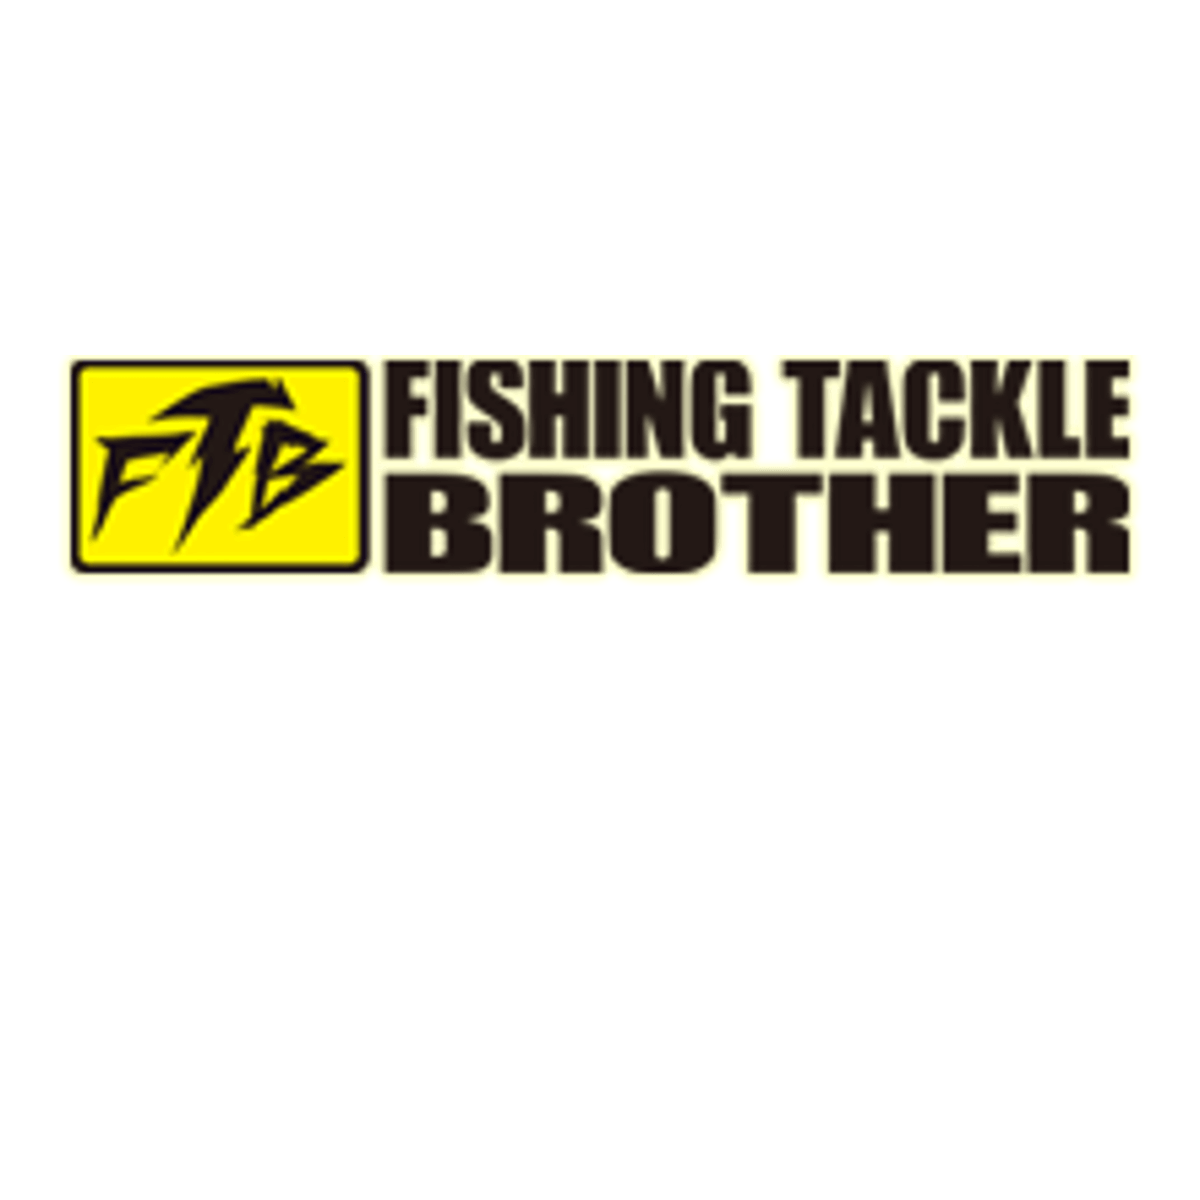 FTB FISHING TACKLE BROTHER